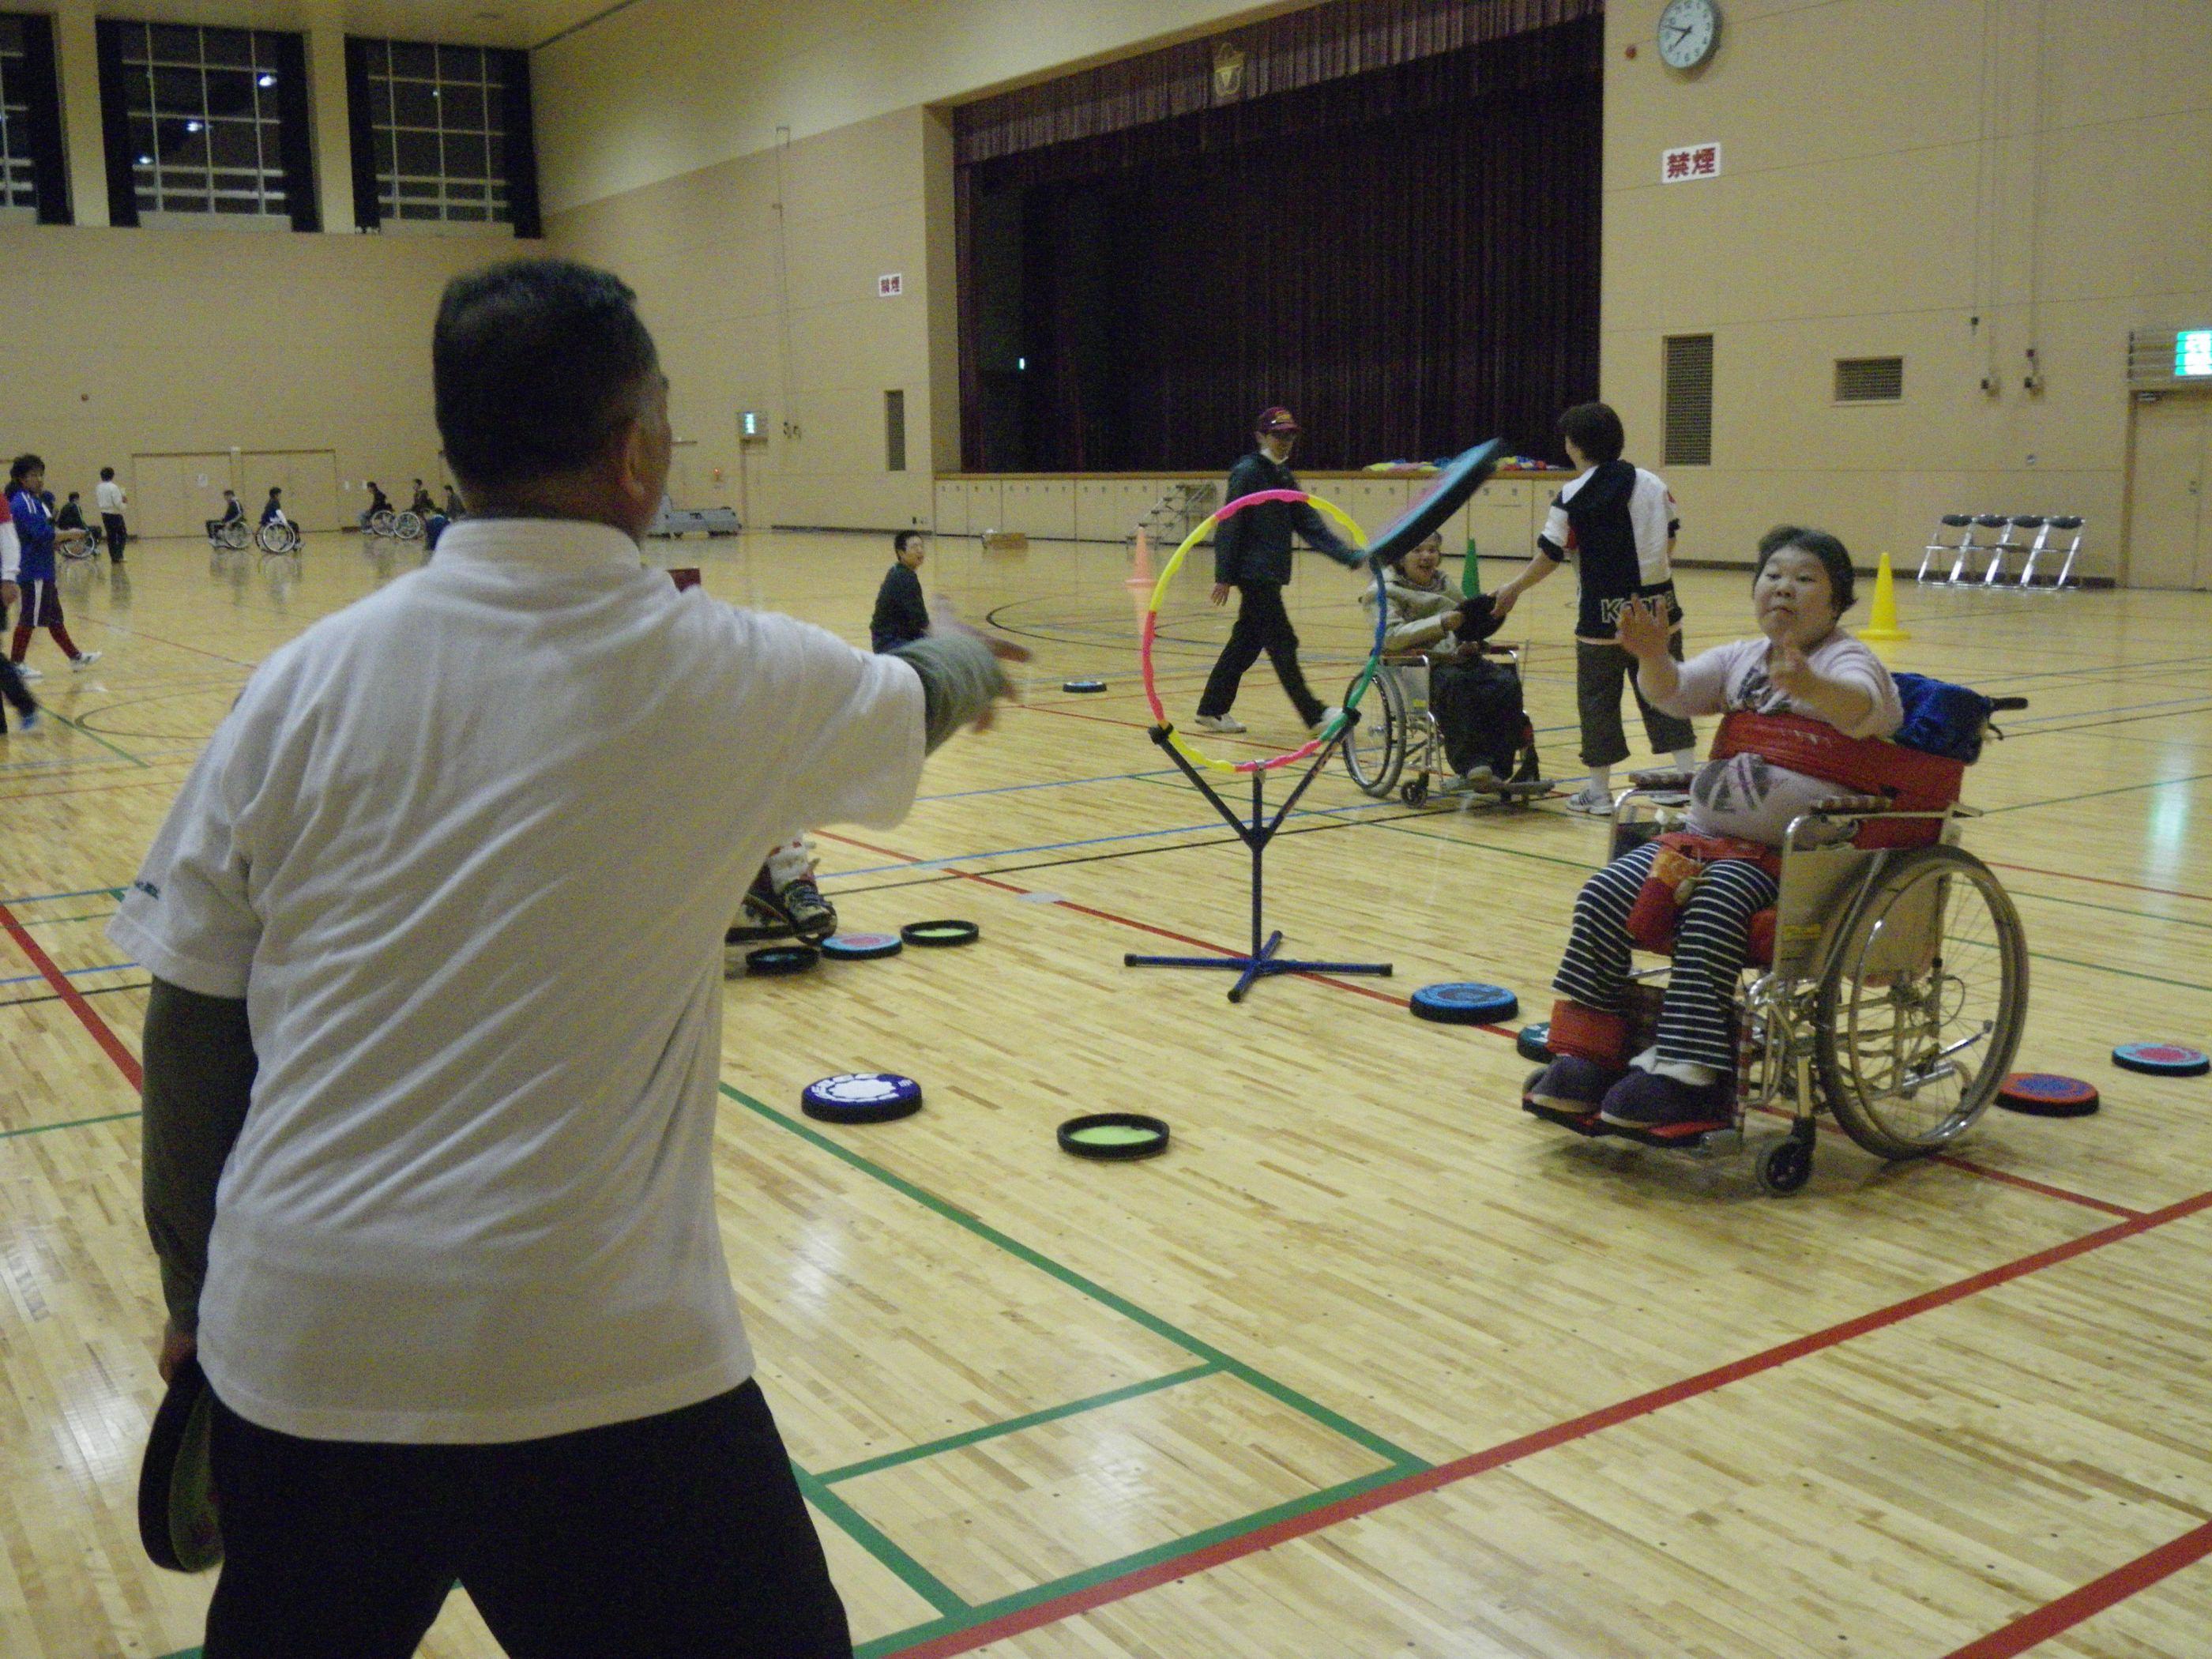 IMGP0072 - 地域支援事業より〜青梅市アダプテッド・スポーツ教室